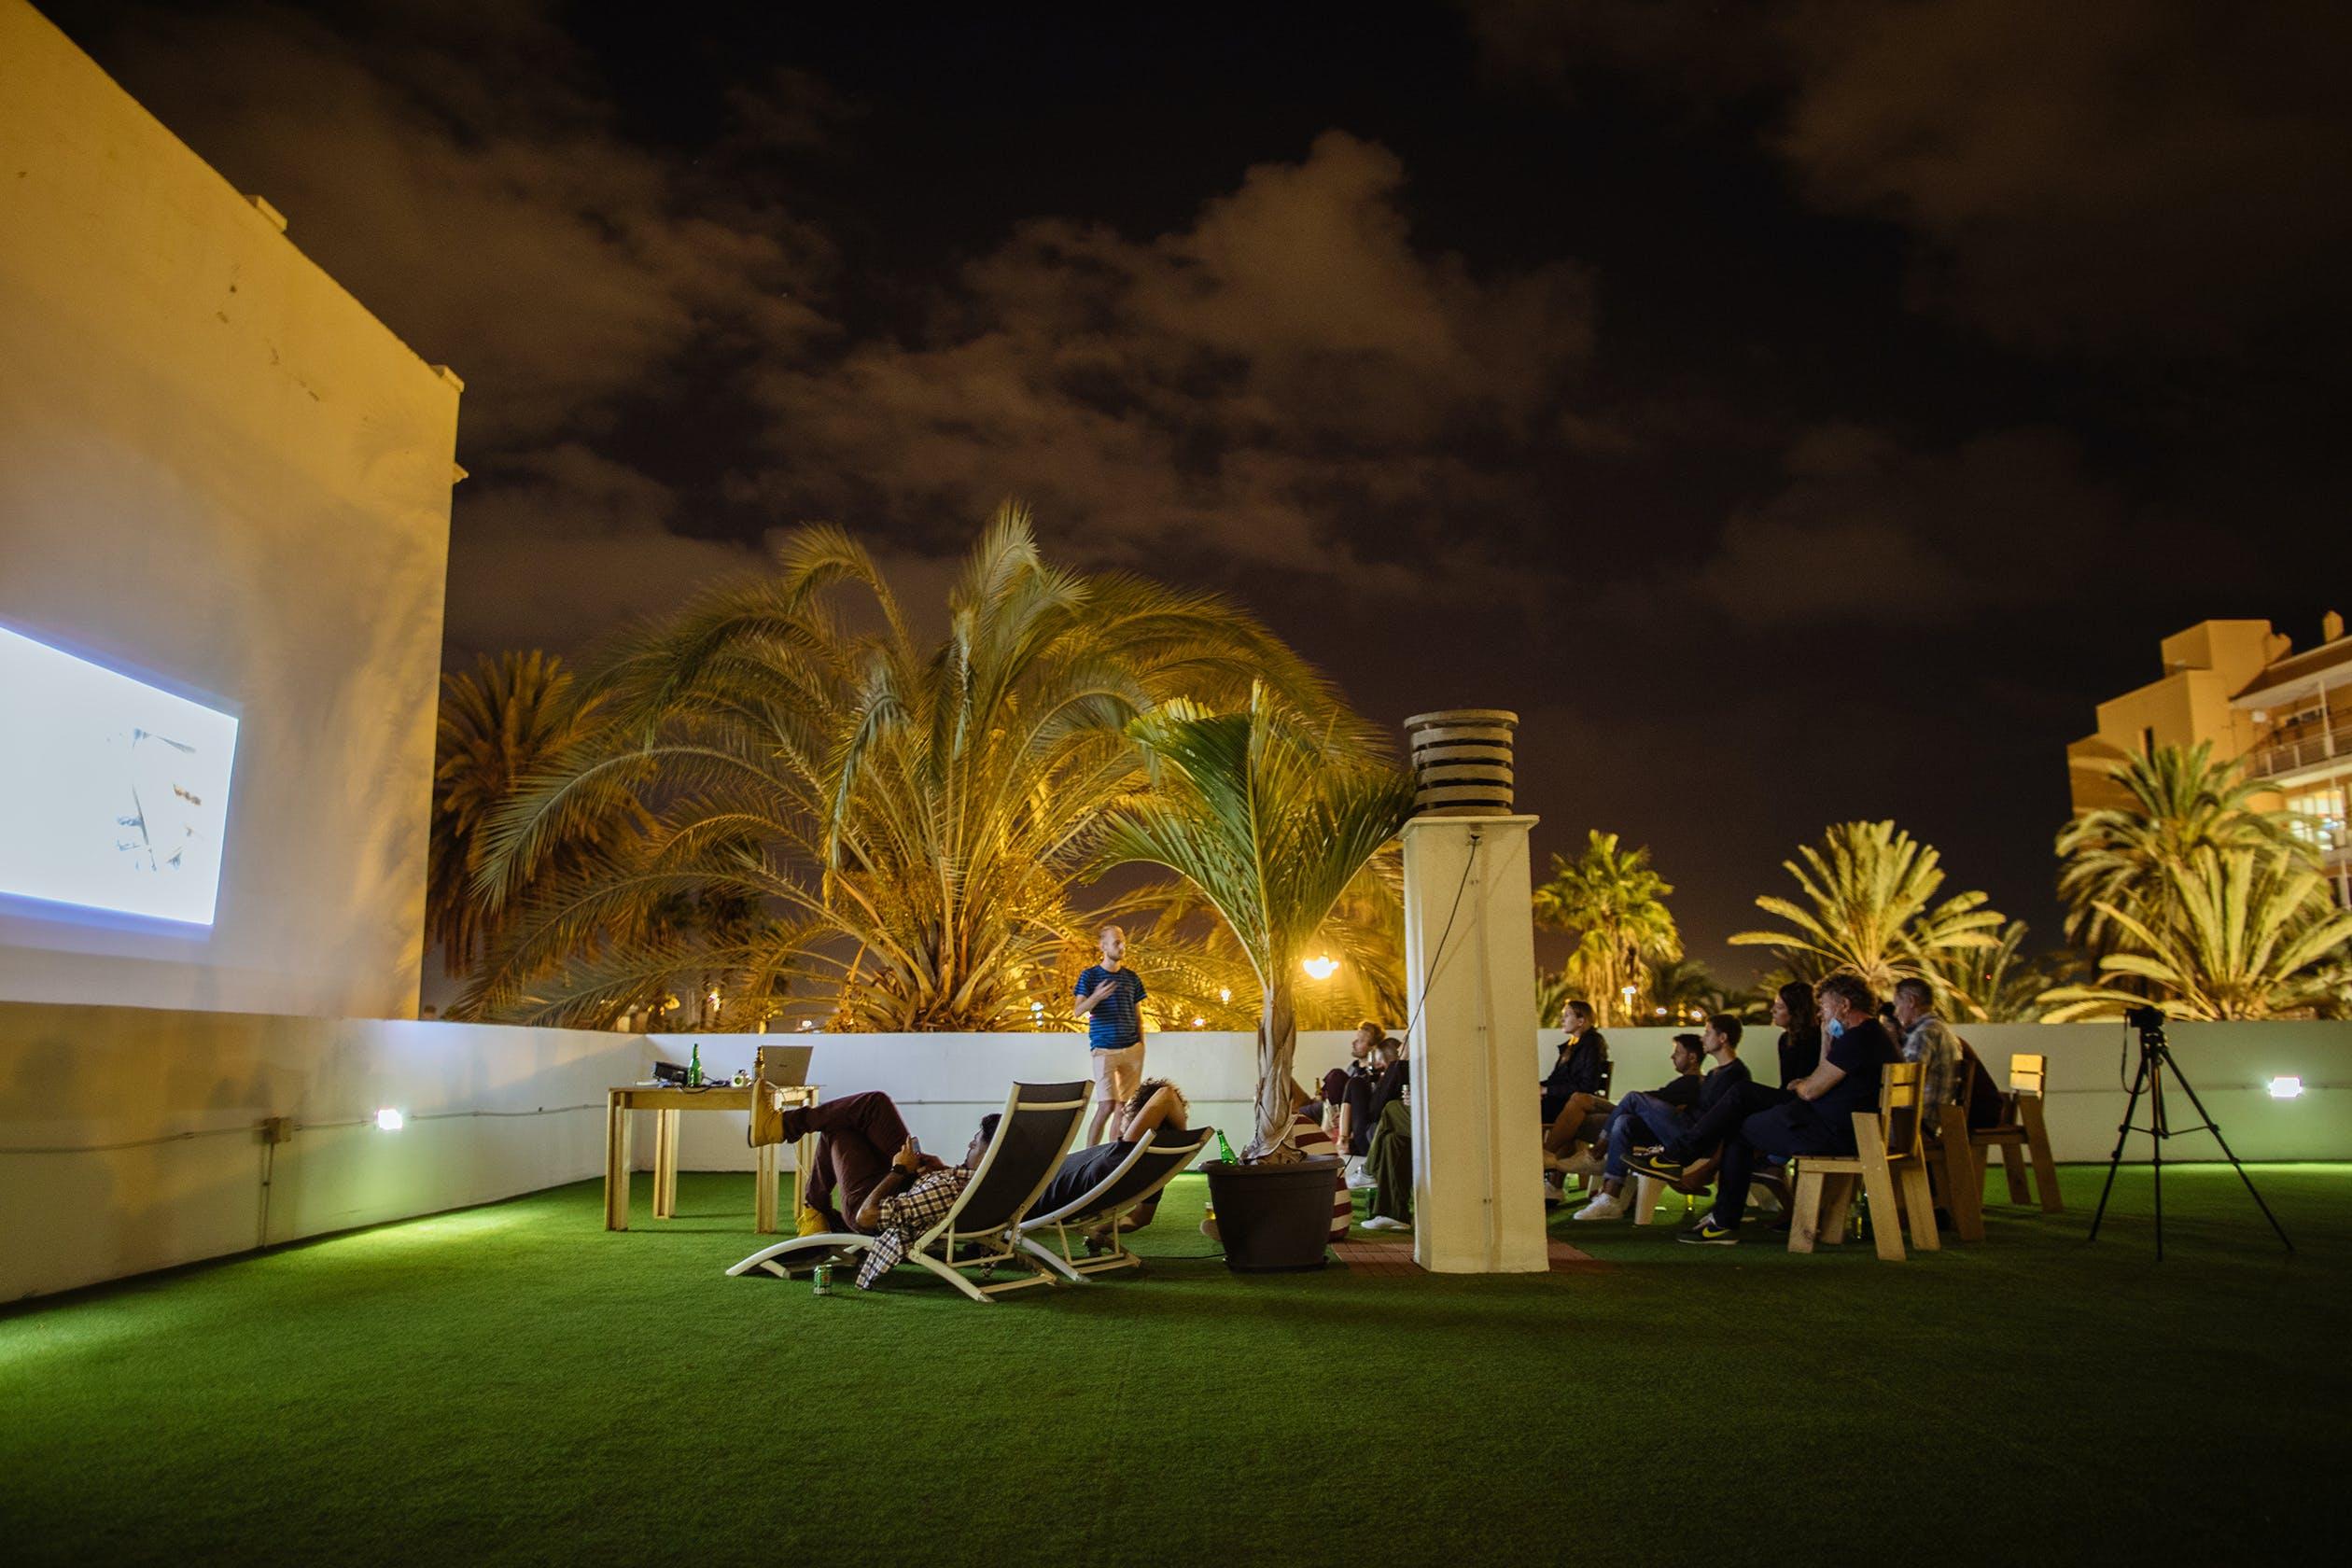 11 Residents | Ciudad Jardín - In the Heart of Las Palmas | Amazing Trendy House w/ Coworking + Rooftop Deck